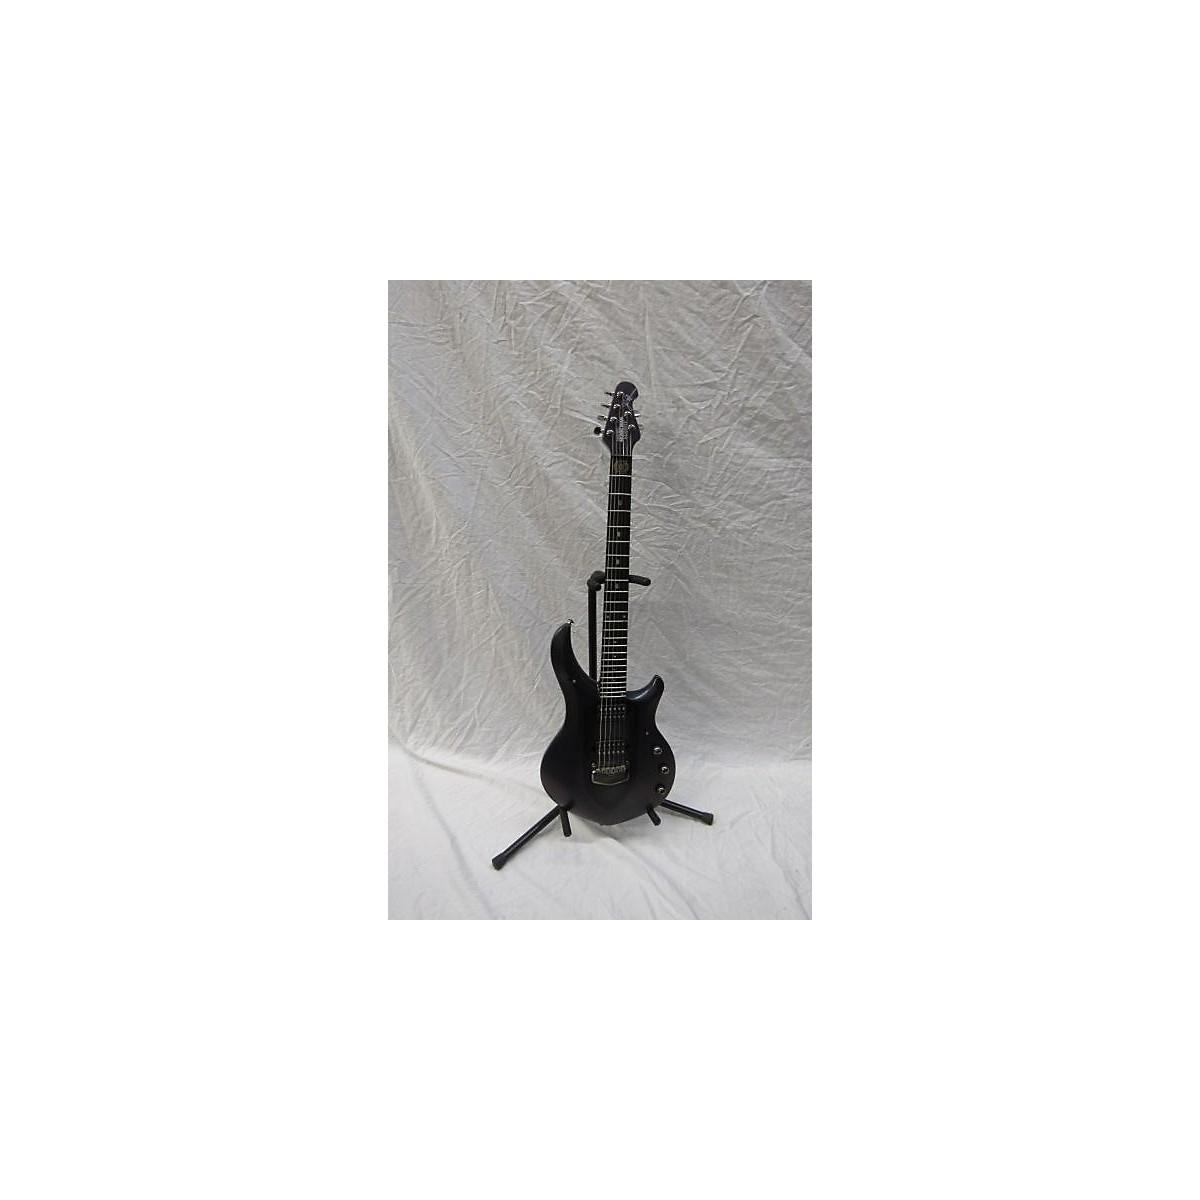 Ernie Ball Music Man John Petrucci Majesty 6 Solid Body Electric Guitar